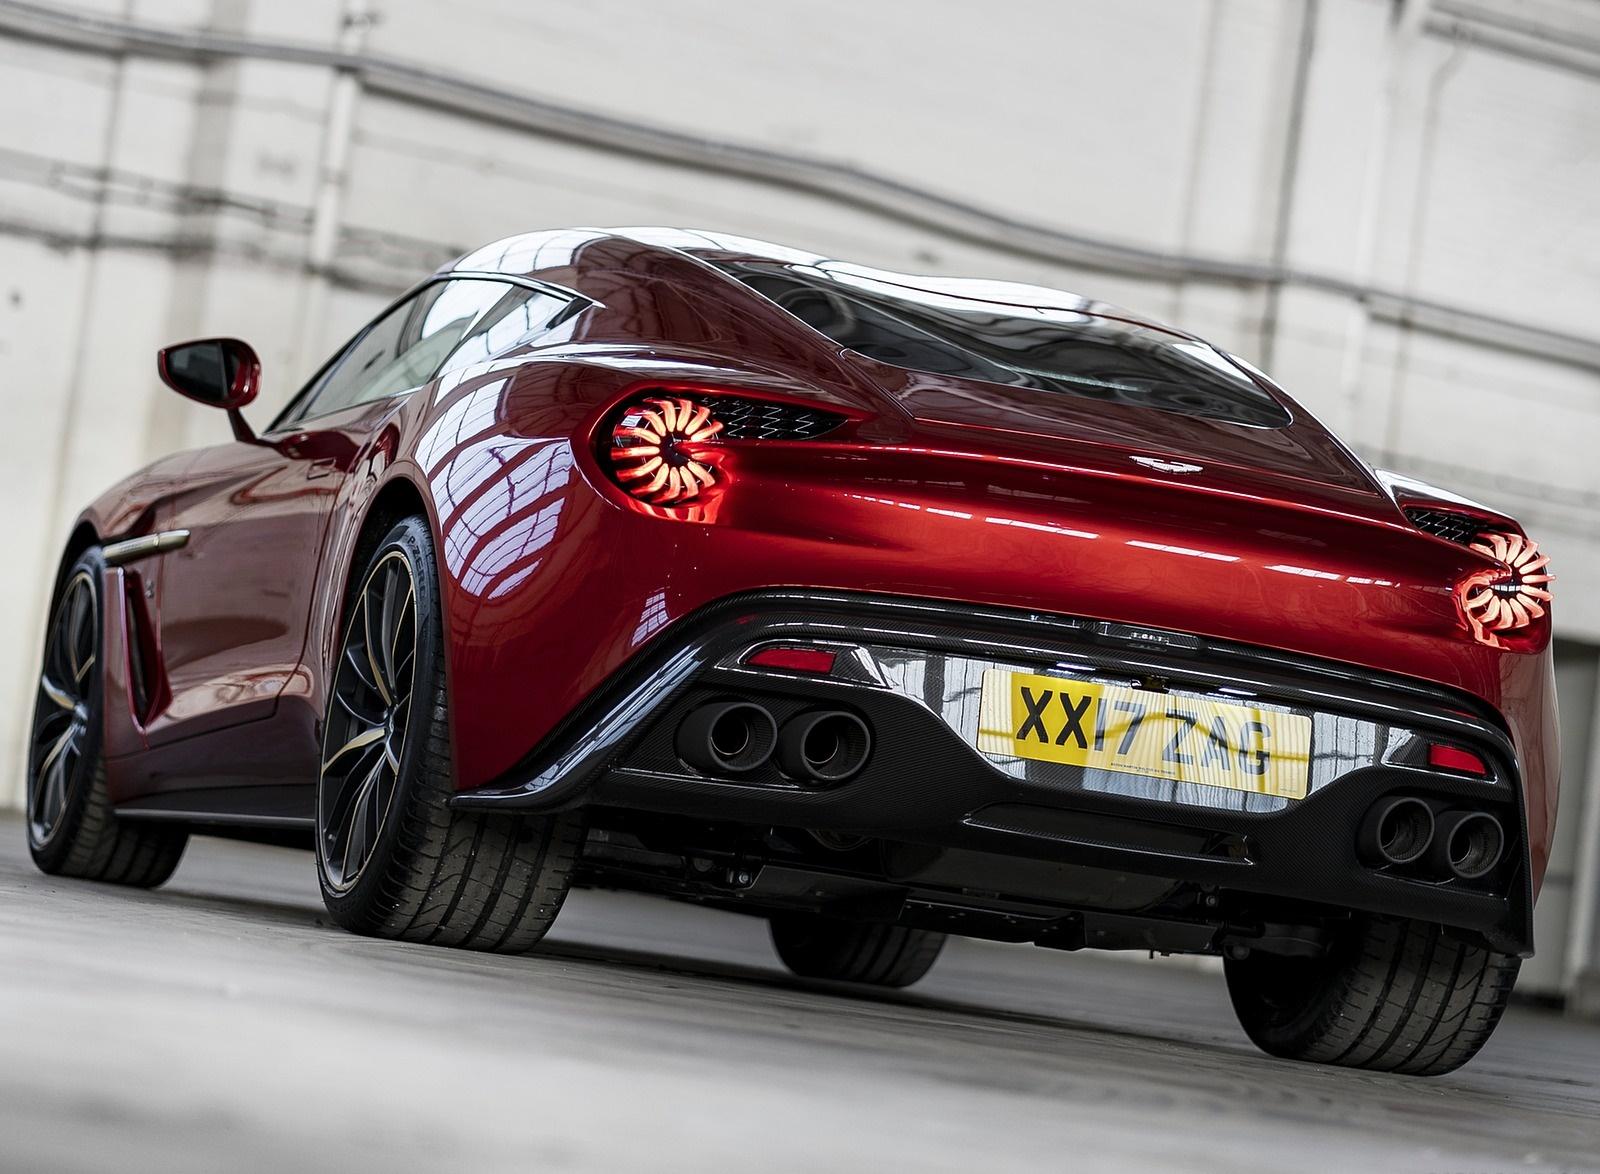 2018 Aston Martin Vanquish Zagato Coupe Rear Wallpapers 12 Newcarcars